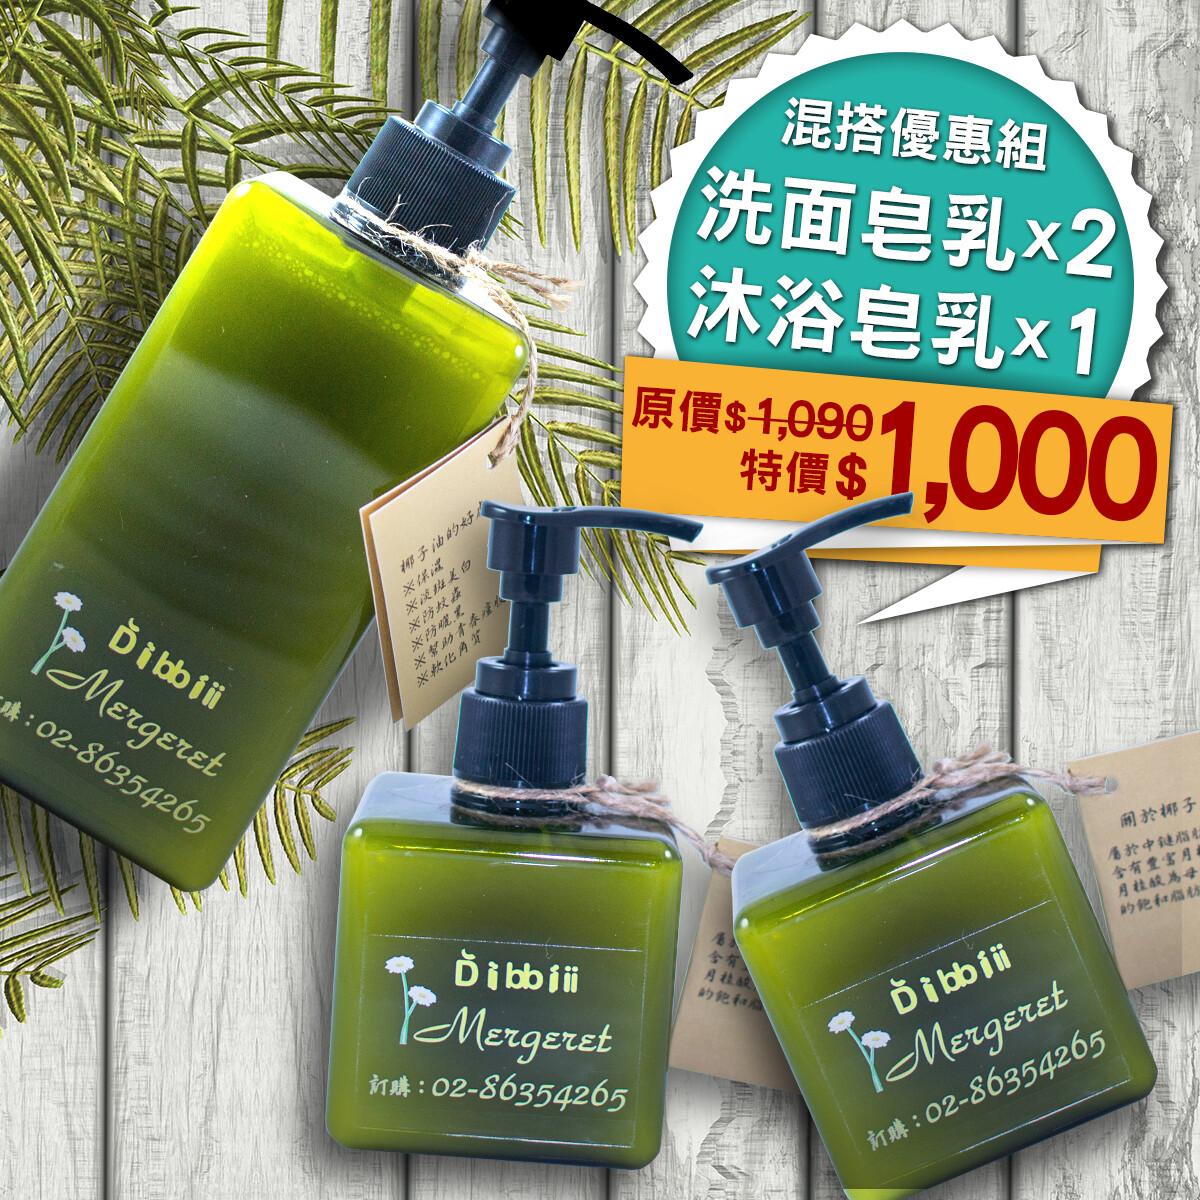 Diibbiiii椰子油美膚皂乳 - 混搭組合:洗面皂乳x2(250ml)+洗澡皂乳x1(500ml) - 活動特惠$1000